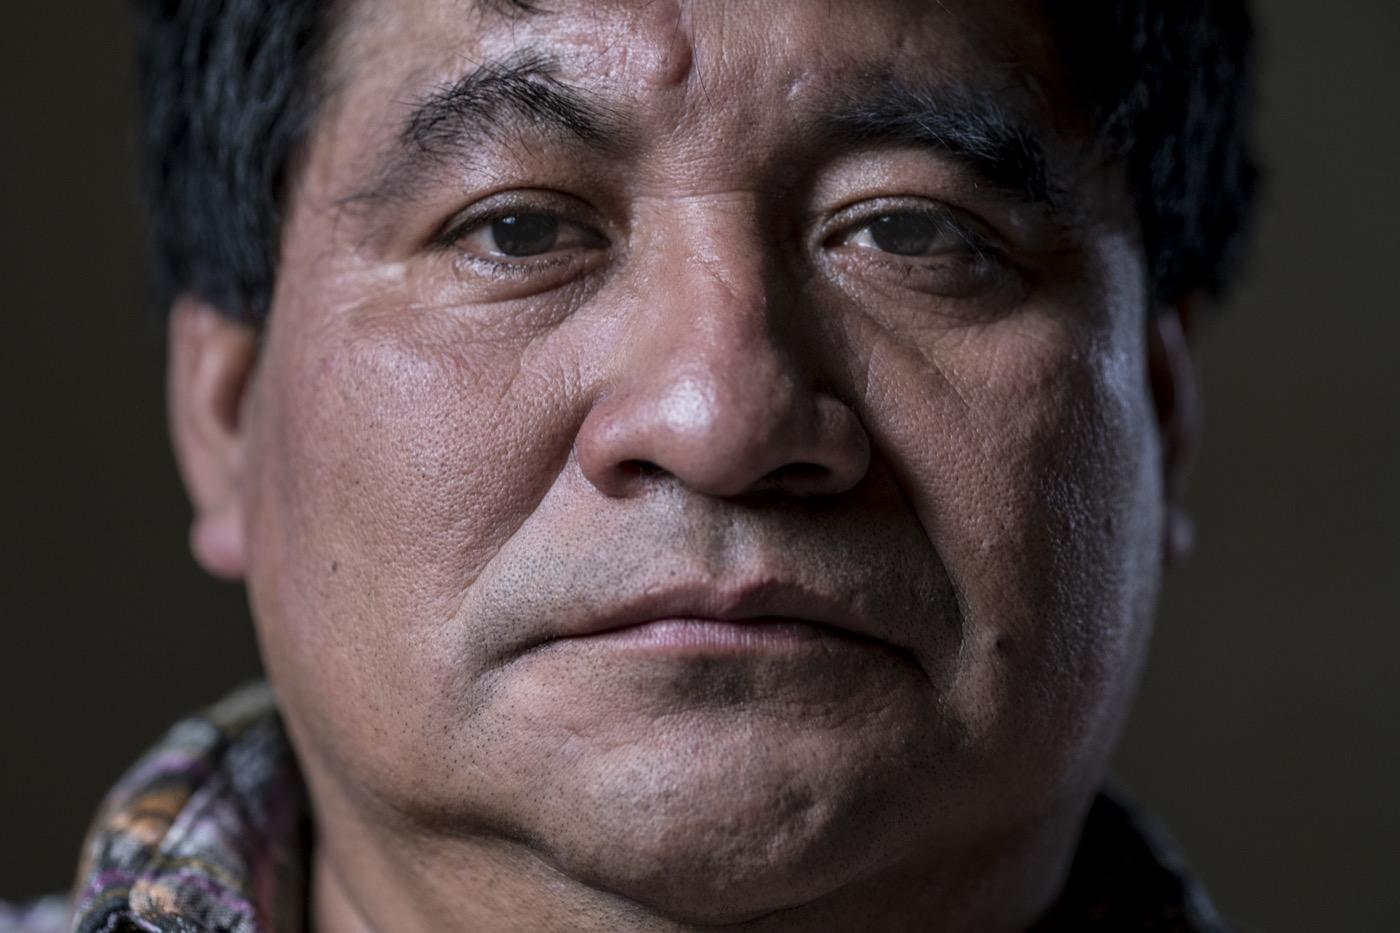 17 Abril 2017. Guatemala. Bernando Caal Xol: Líder comunal